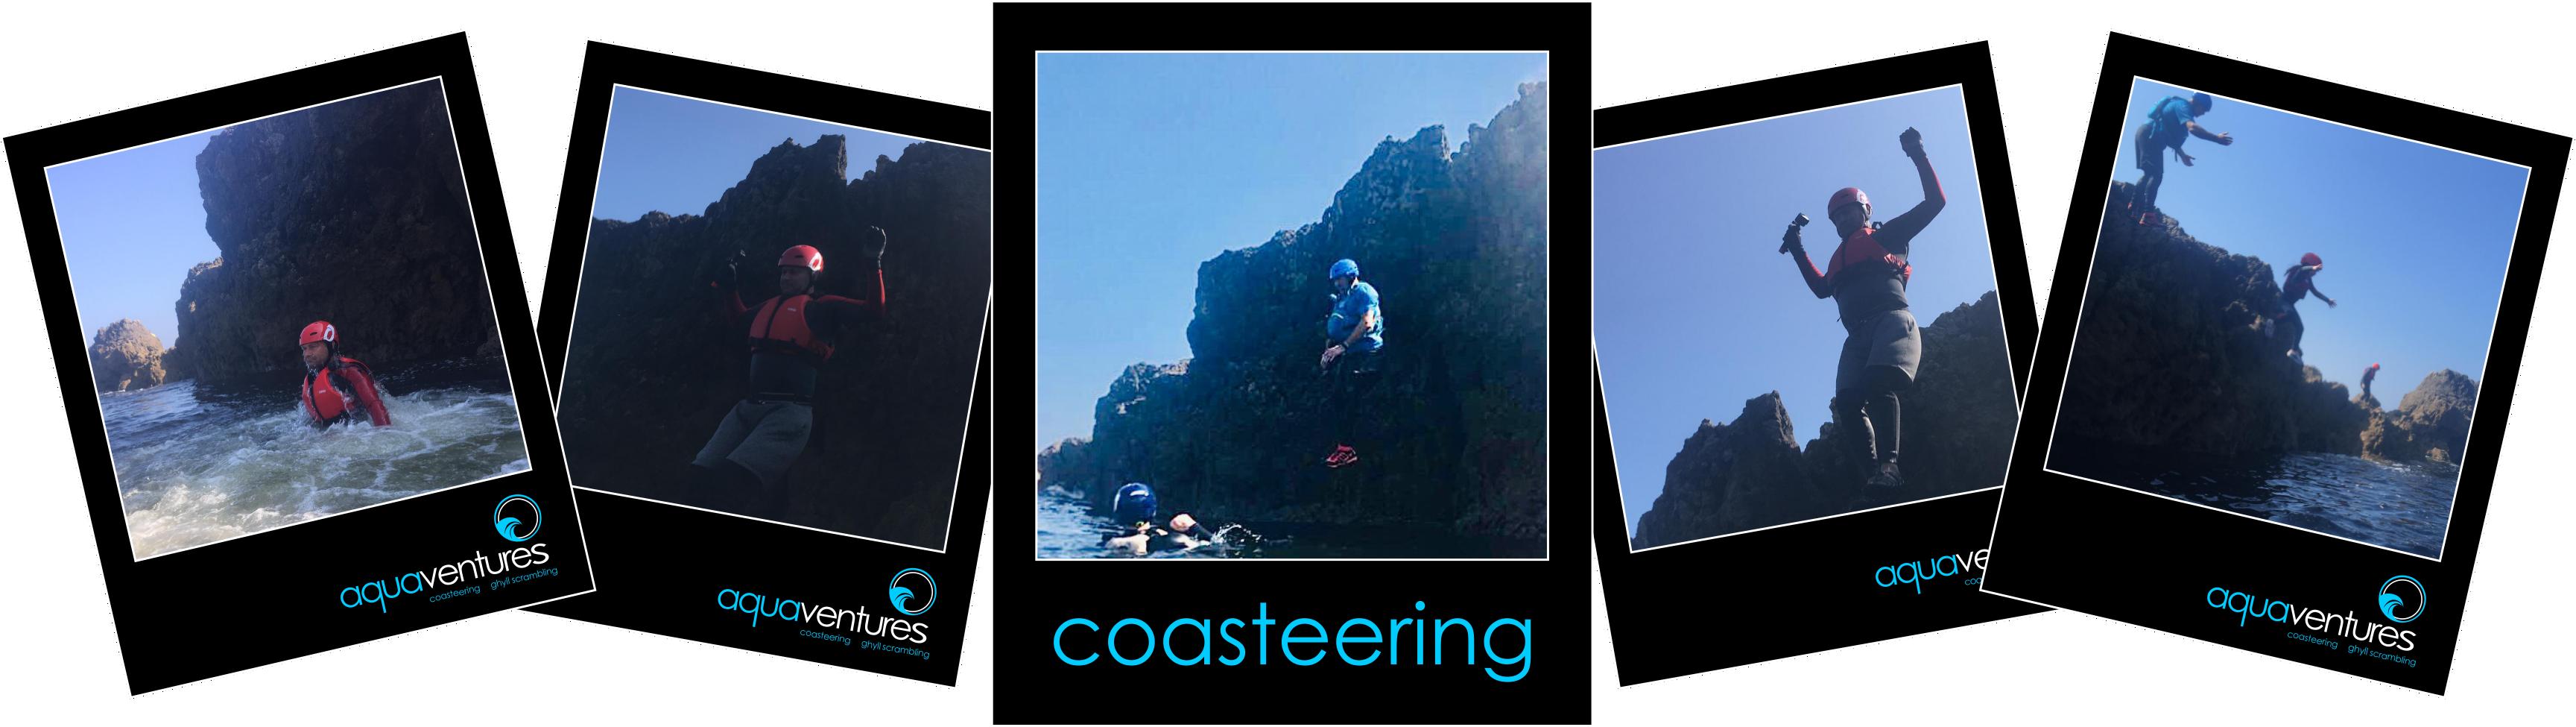 Coast2 1.0